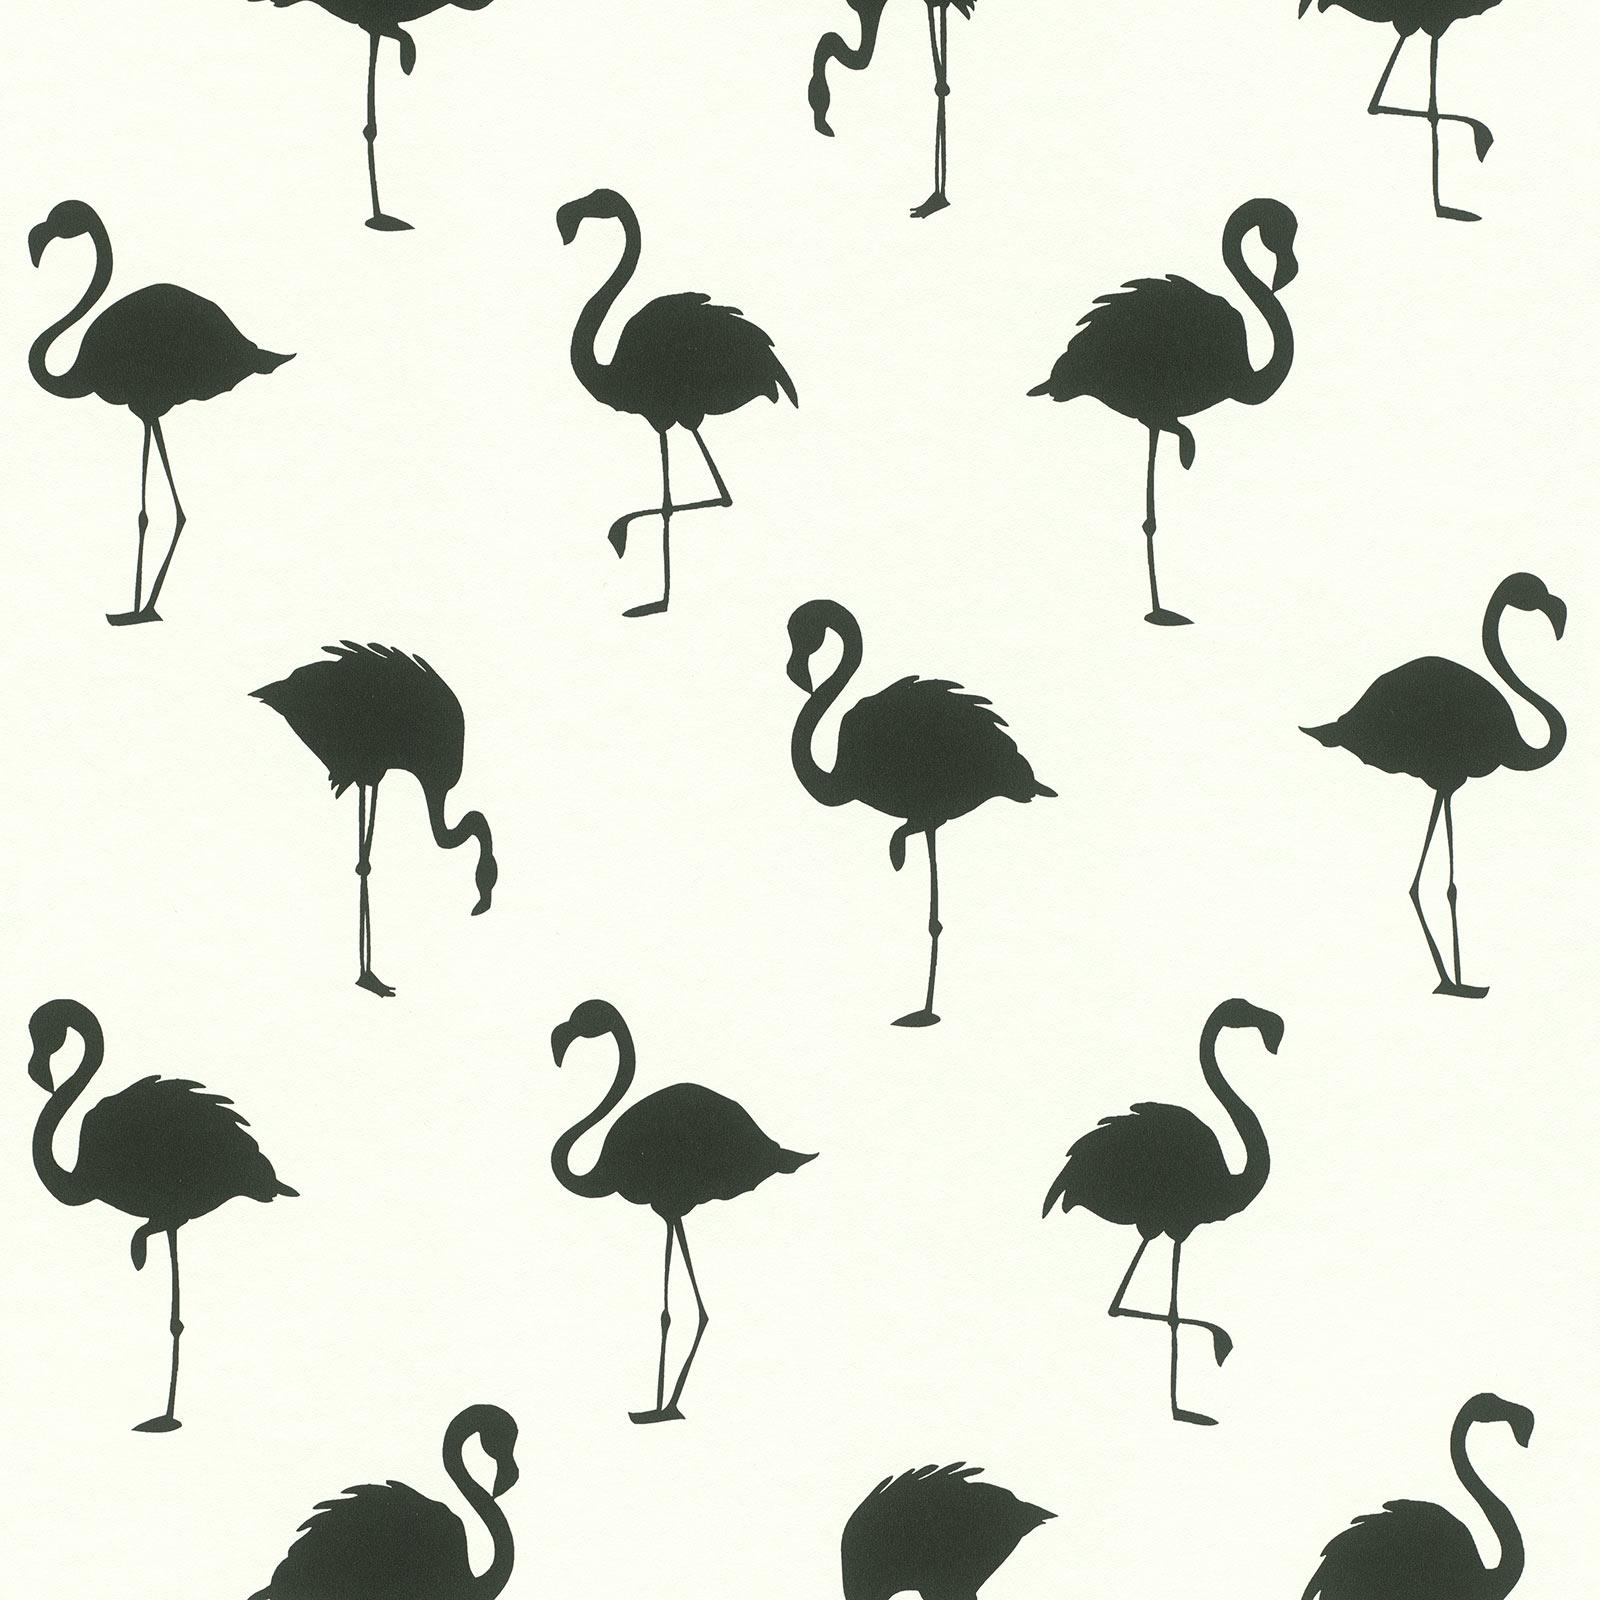 vliestapete flamingo schatten wei schwarz 138993. Black Bedroom Furniture Sets. Home Design Ideas